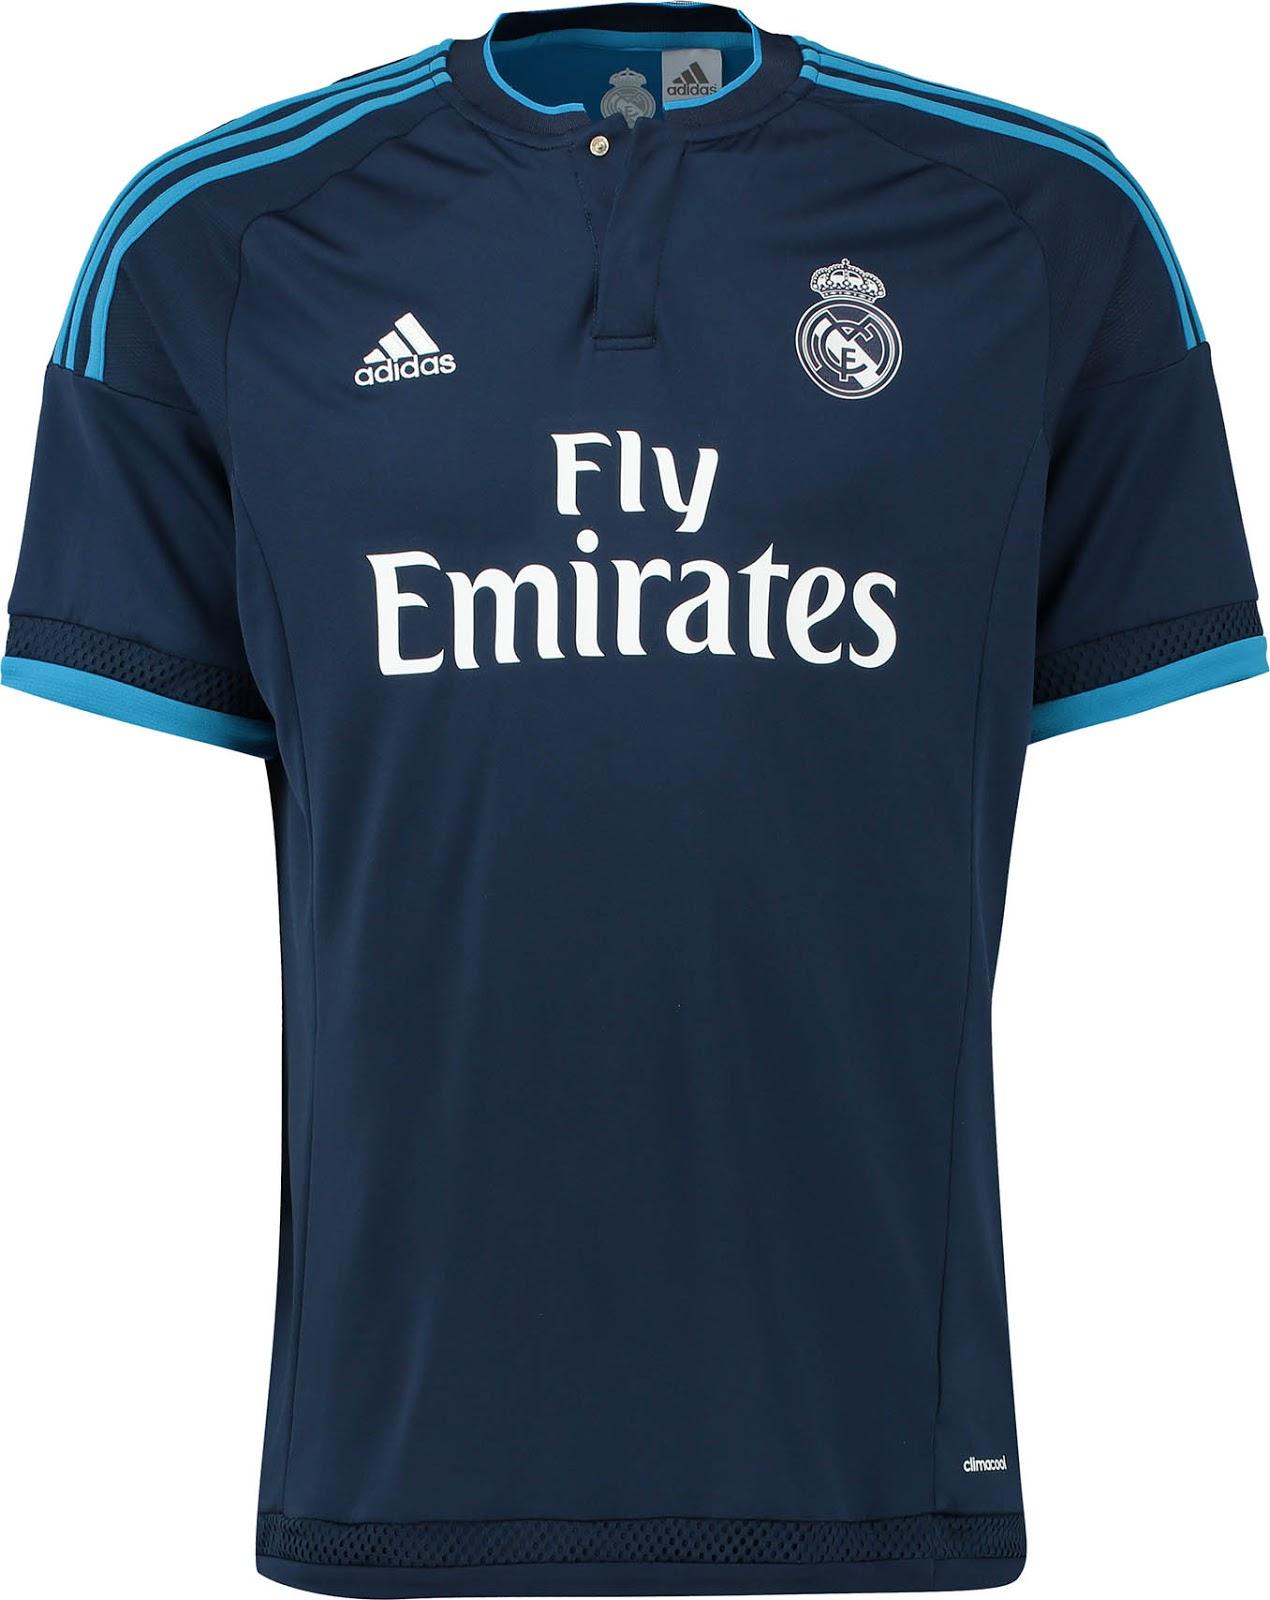 new styles 4212d 96a48 REAL MADRID THIRD KIT - Junans Bannas